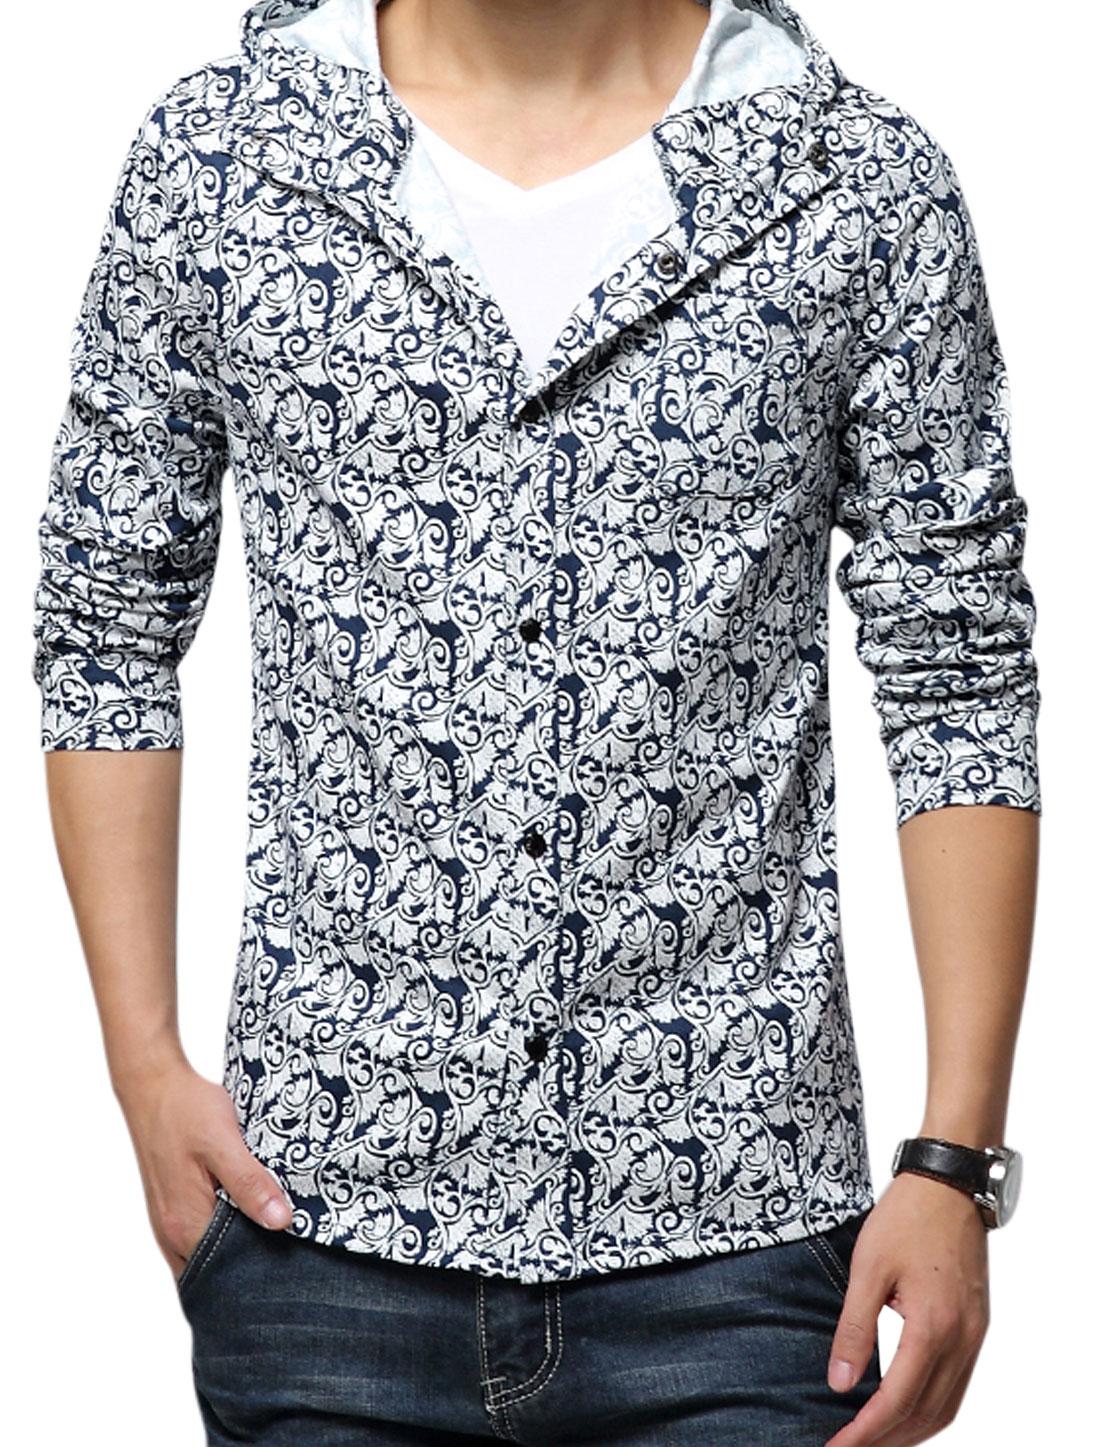 Men Hooded Novelty Prints Single Chest Pocket Button Up Jacket Navy Blue White S